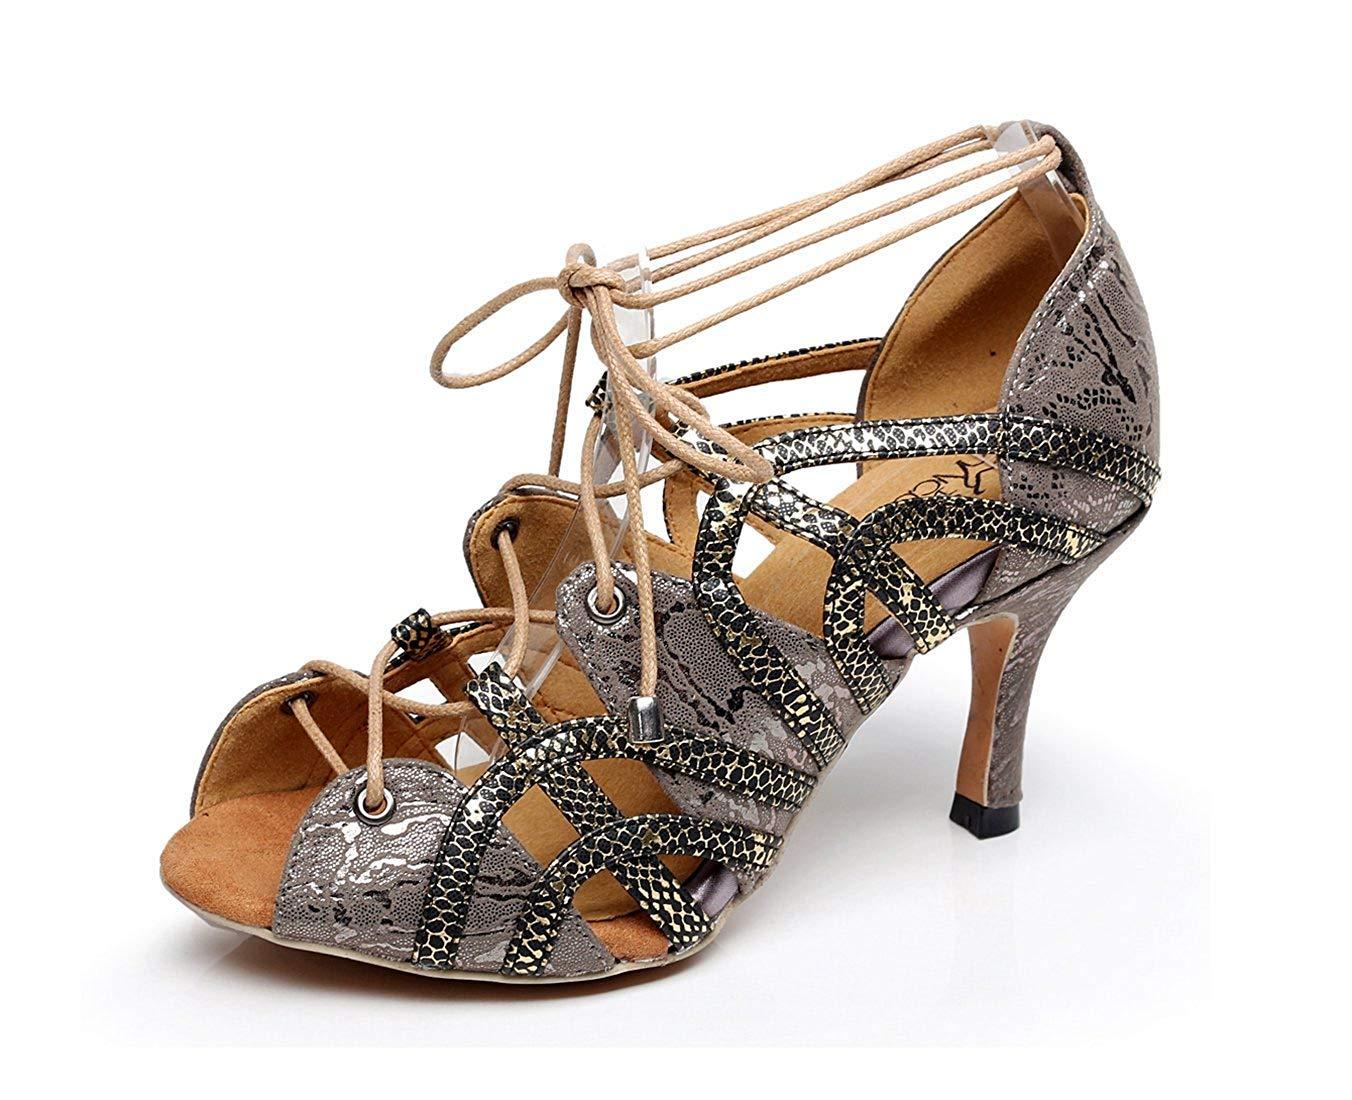 Qiusa Damen Weiche Gummisohle Peep Toe Dunkelgrau Synthetisch Salsa Latin Tanzschuhe Party Sandalen UK 7.5 (Farbe   - Größe   -)